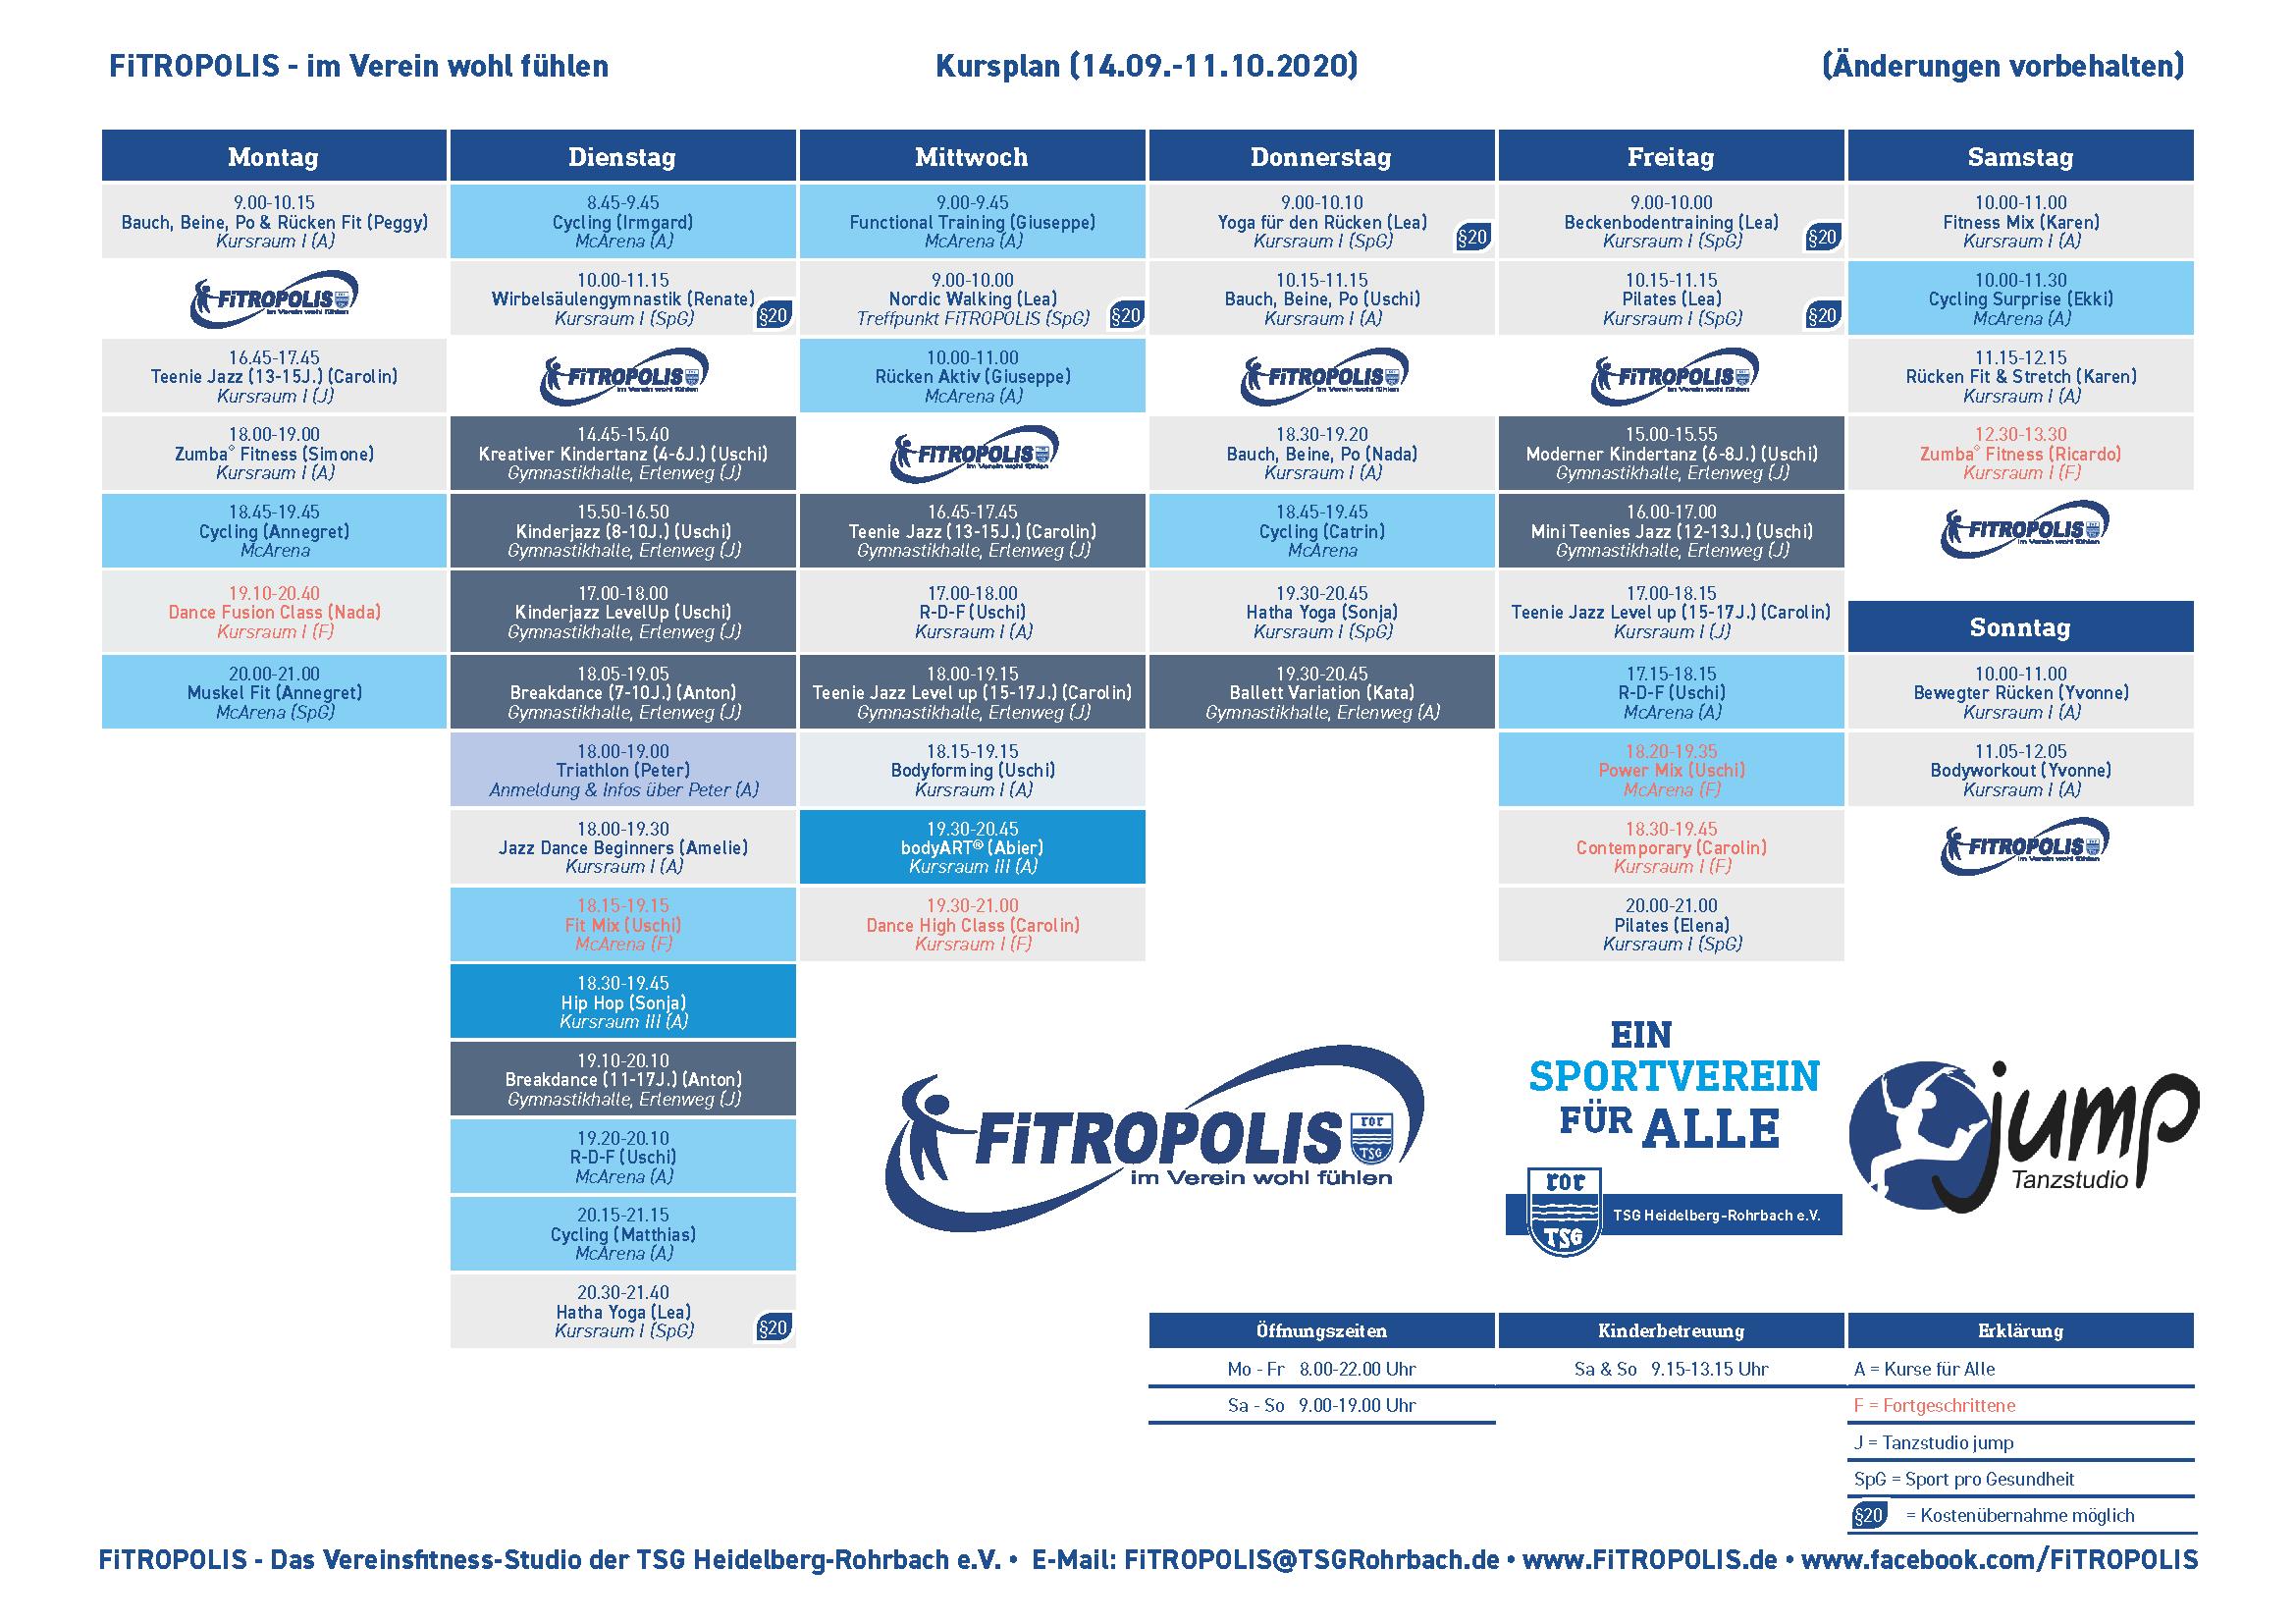 Neuer Kursplan Im FiTROPOLIS Ab 14. September